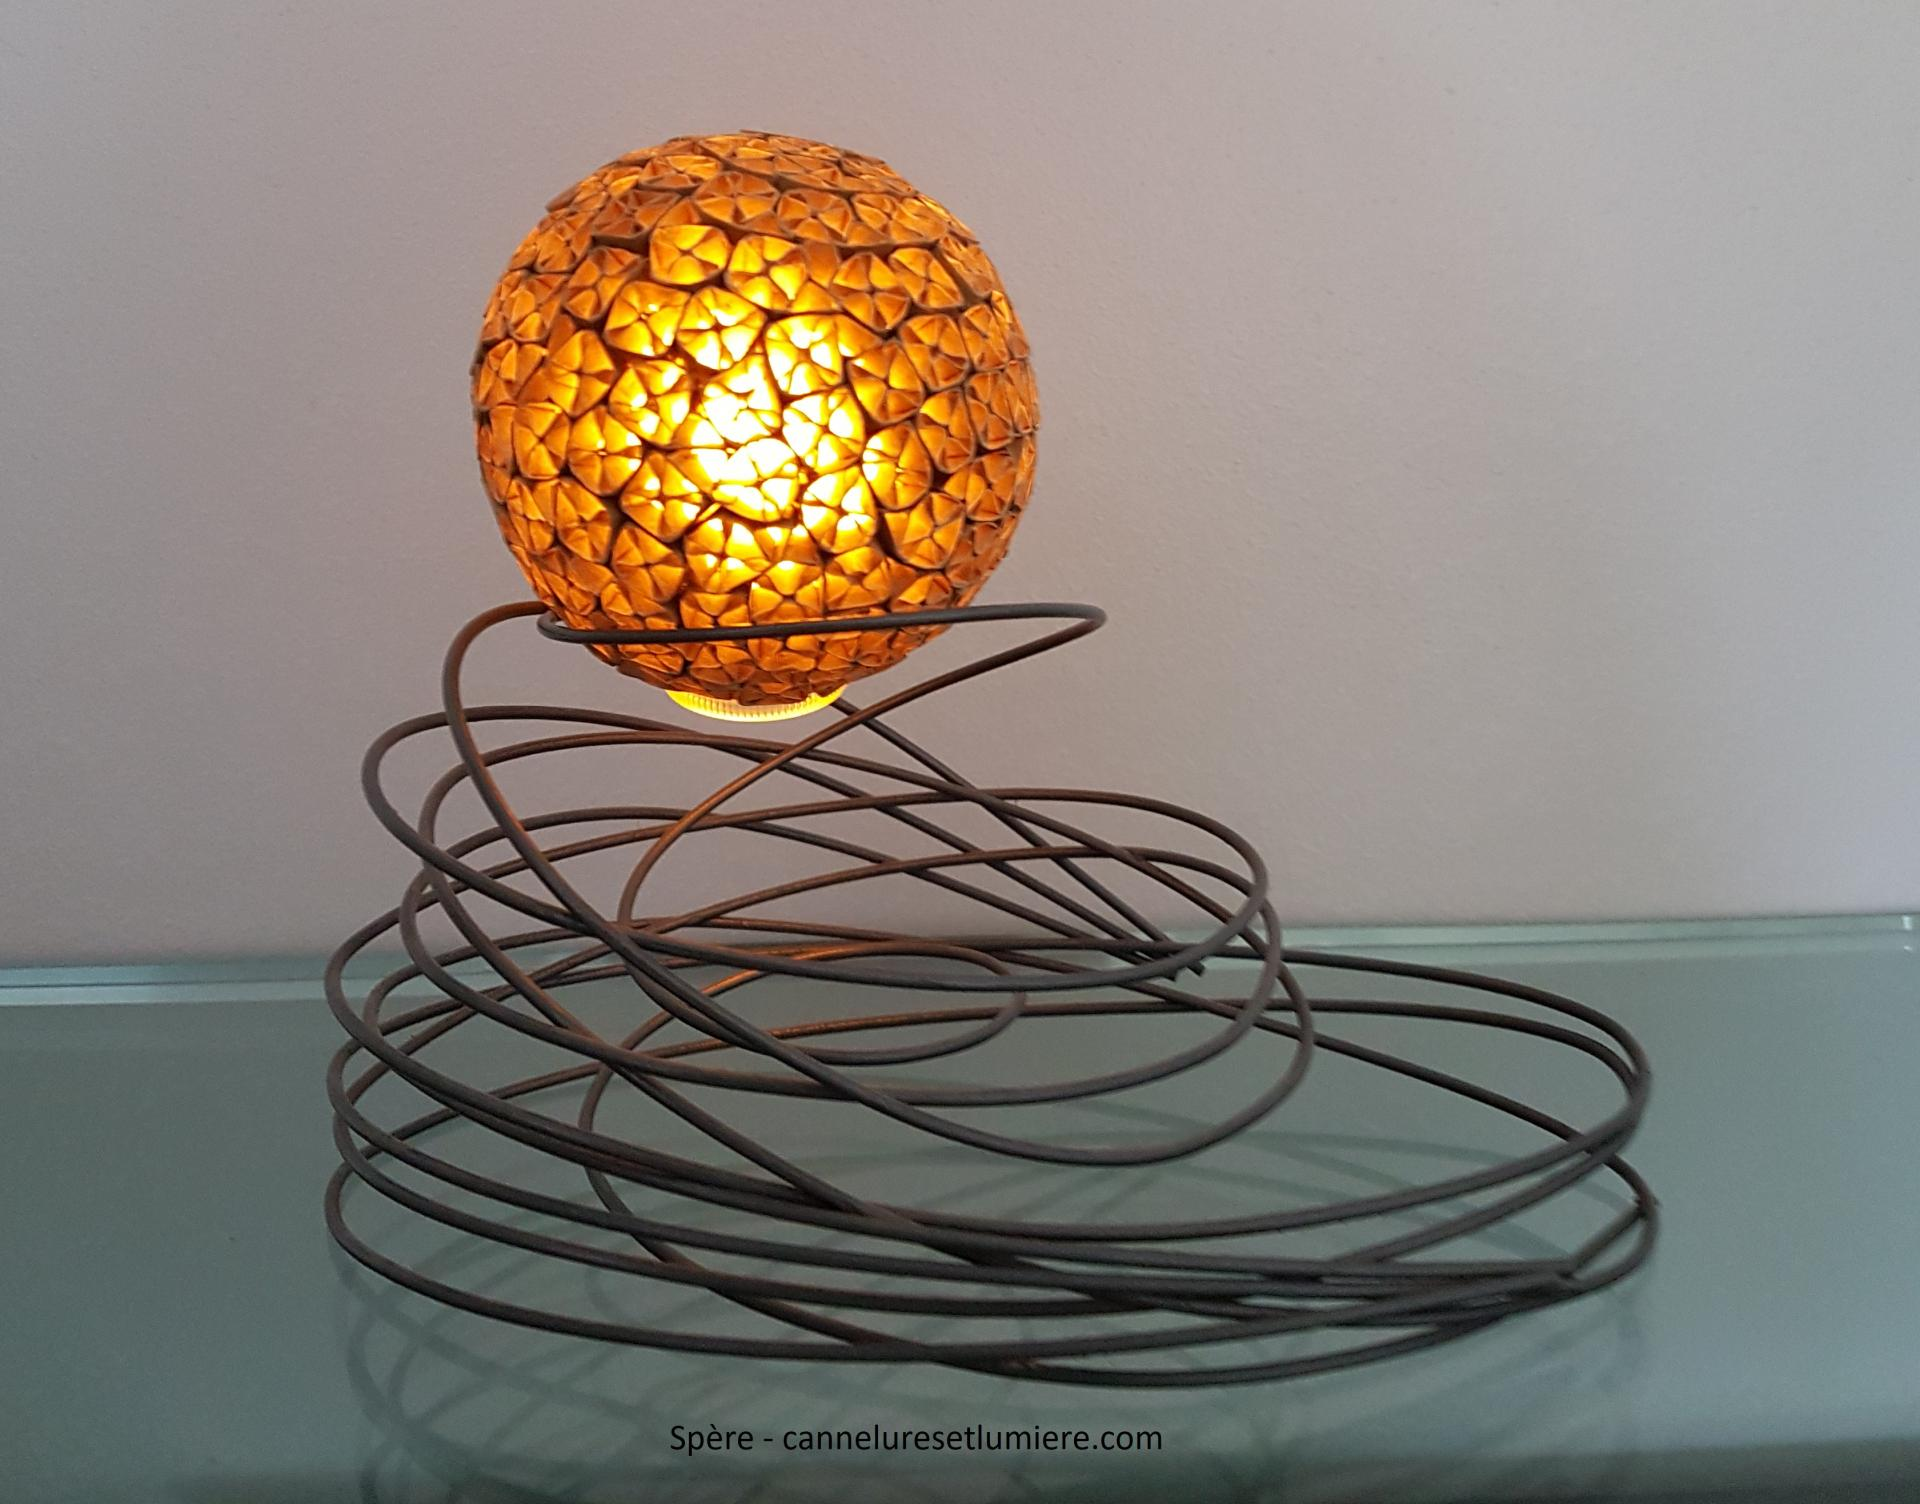 Sphere s